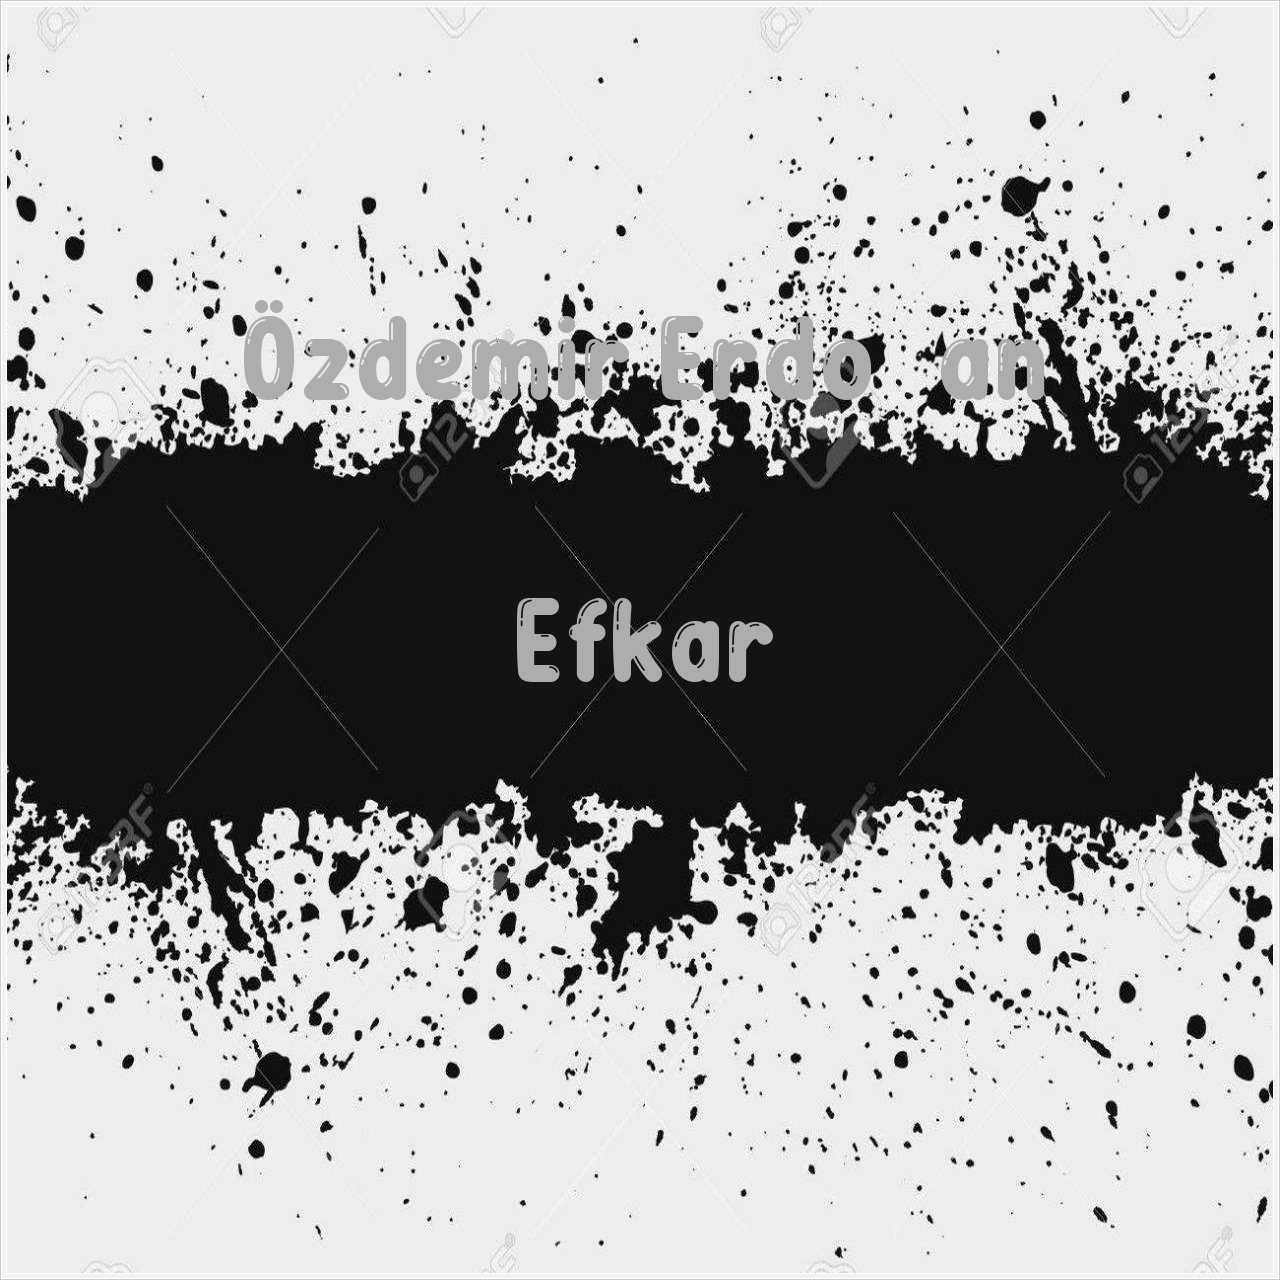 دانلود آهنگ جدید Özdemir Erdoğan به نام Efkar